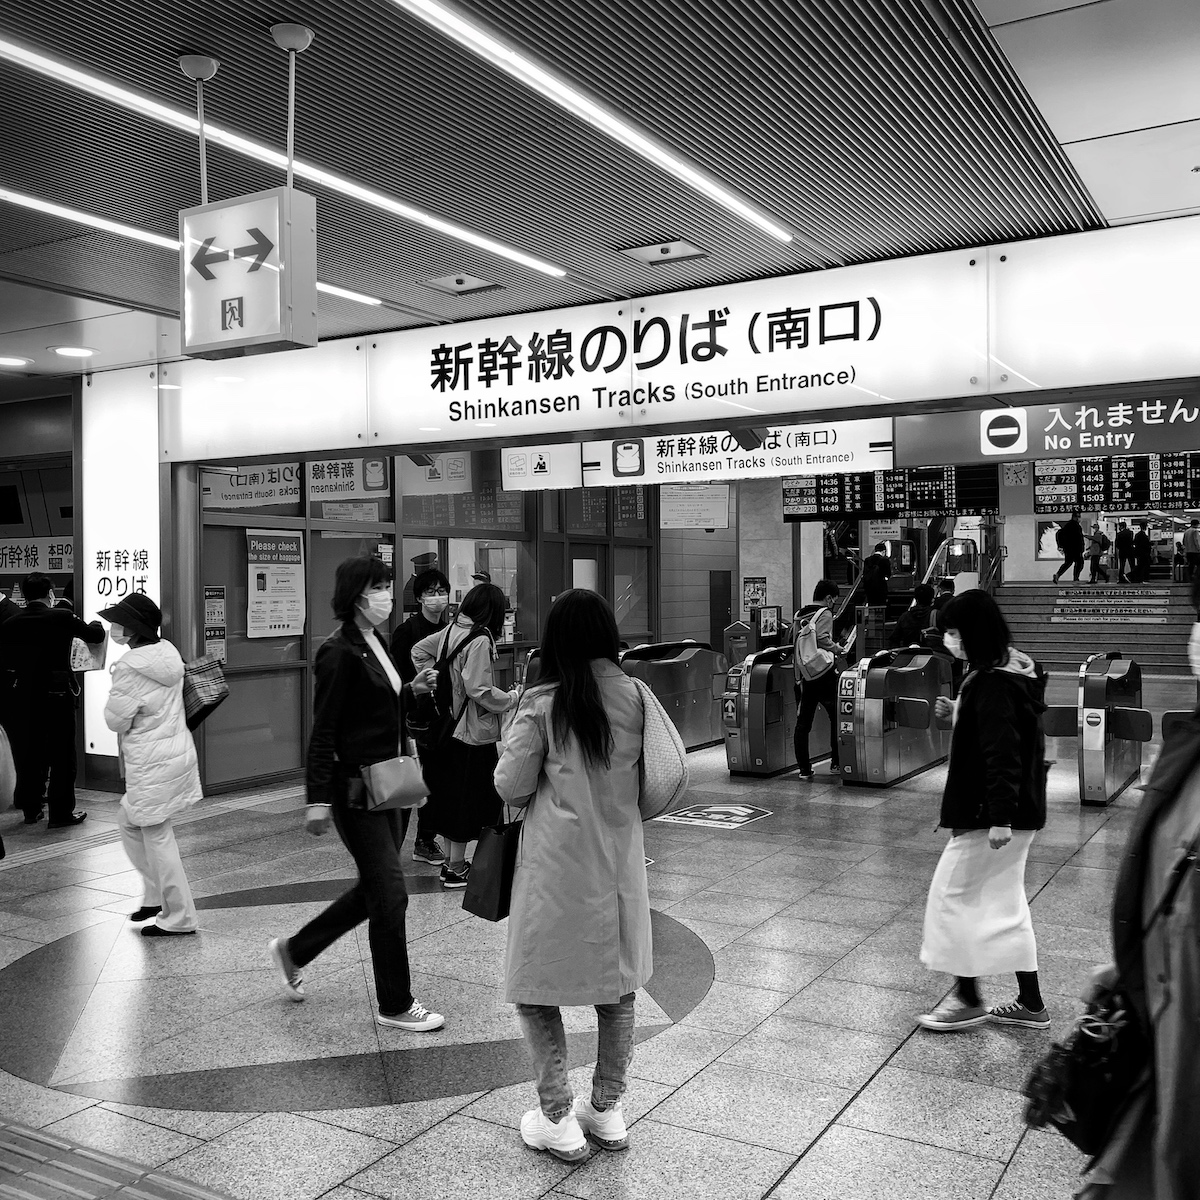 f:id:nagoya-meshi:20210416223108j:plain